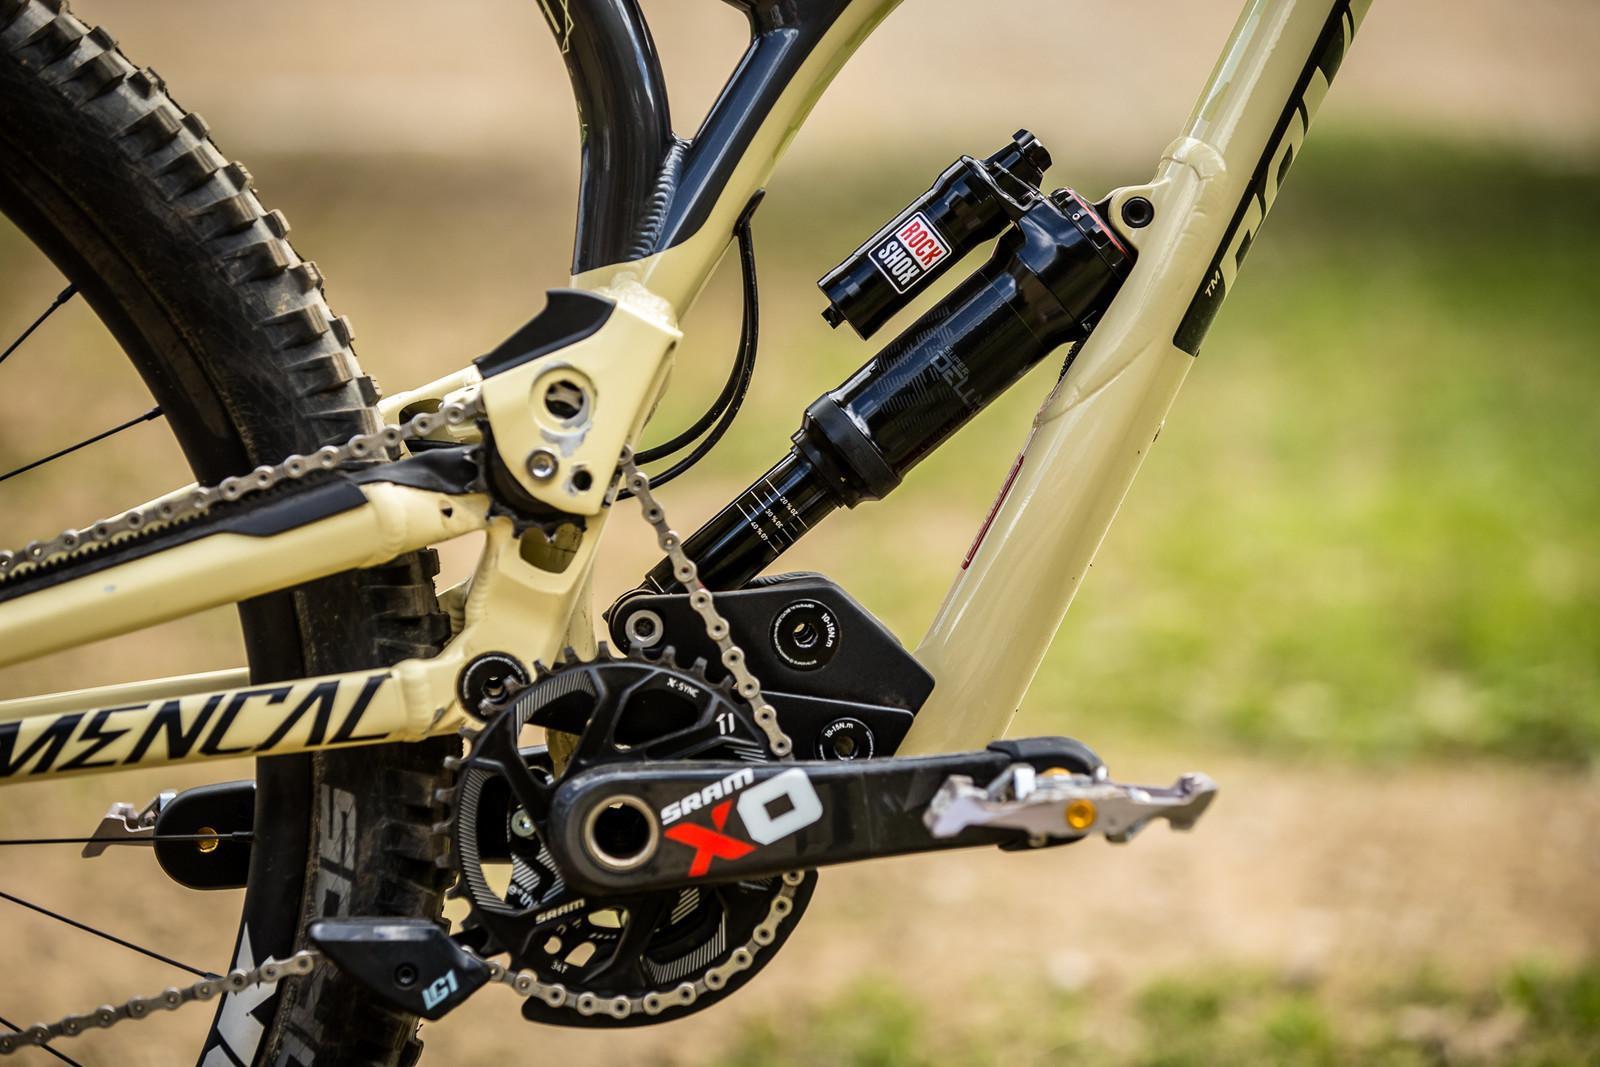 Linkage Goods - WINNING BIKE - Amaury Pierron's Commencal Supreme DH 29 - Mountain Biking Pictures - Vital MTB